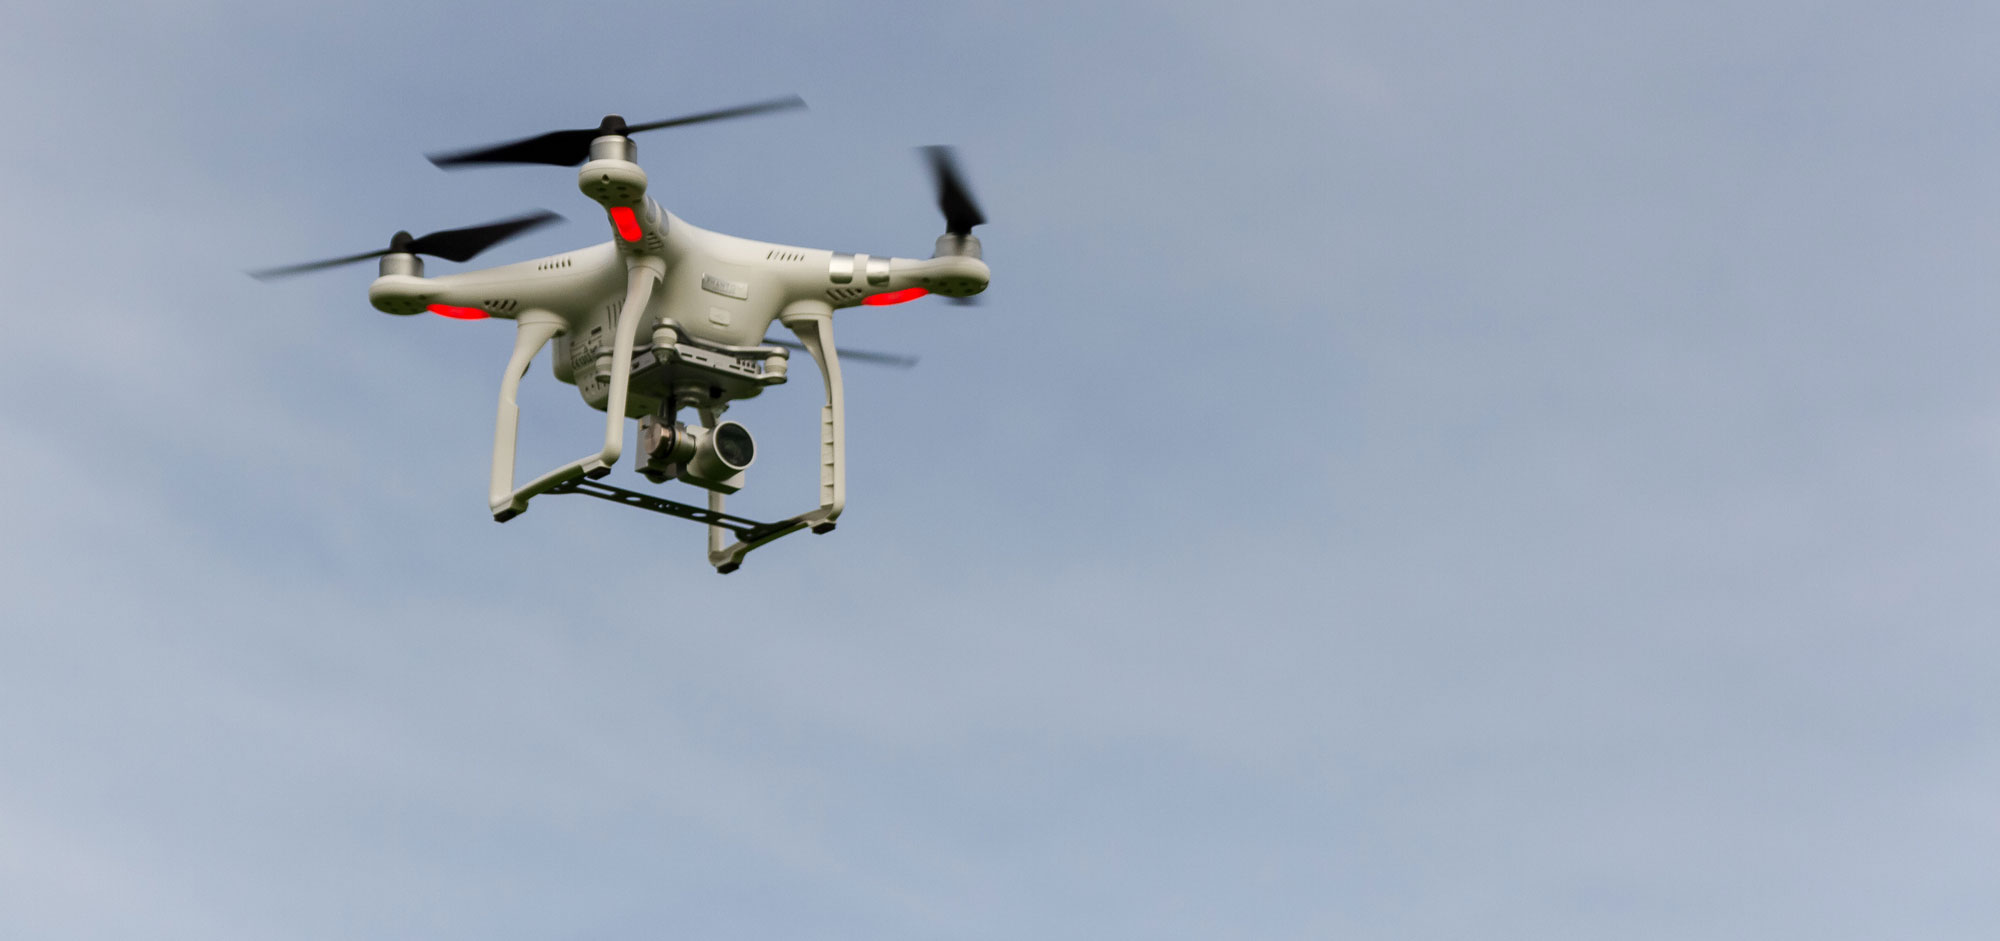 DJI Phantom drone. Photo: flickr user Lee